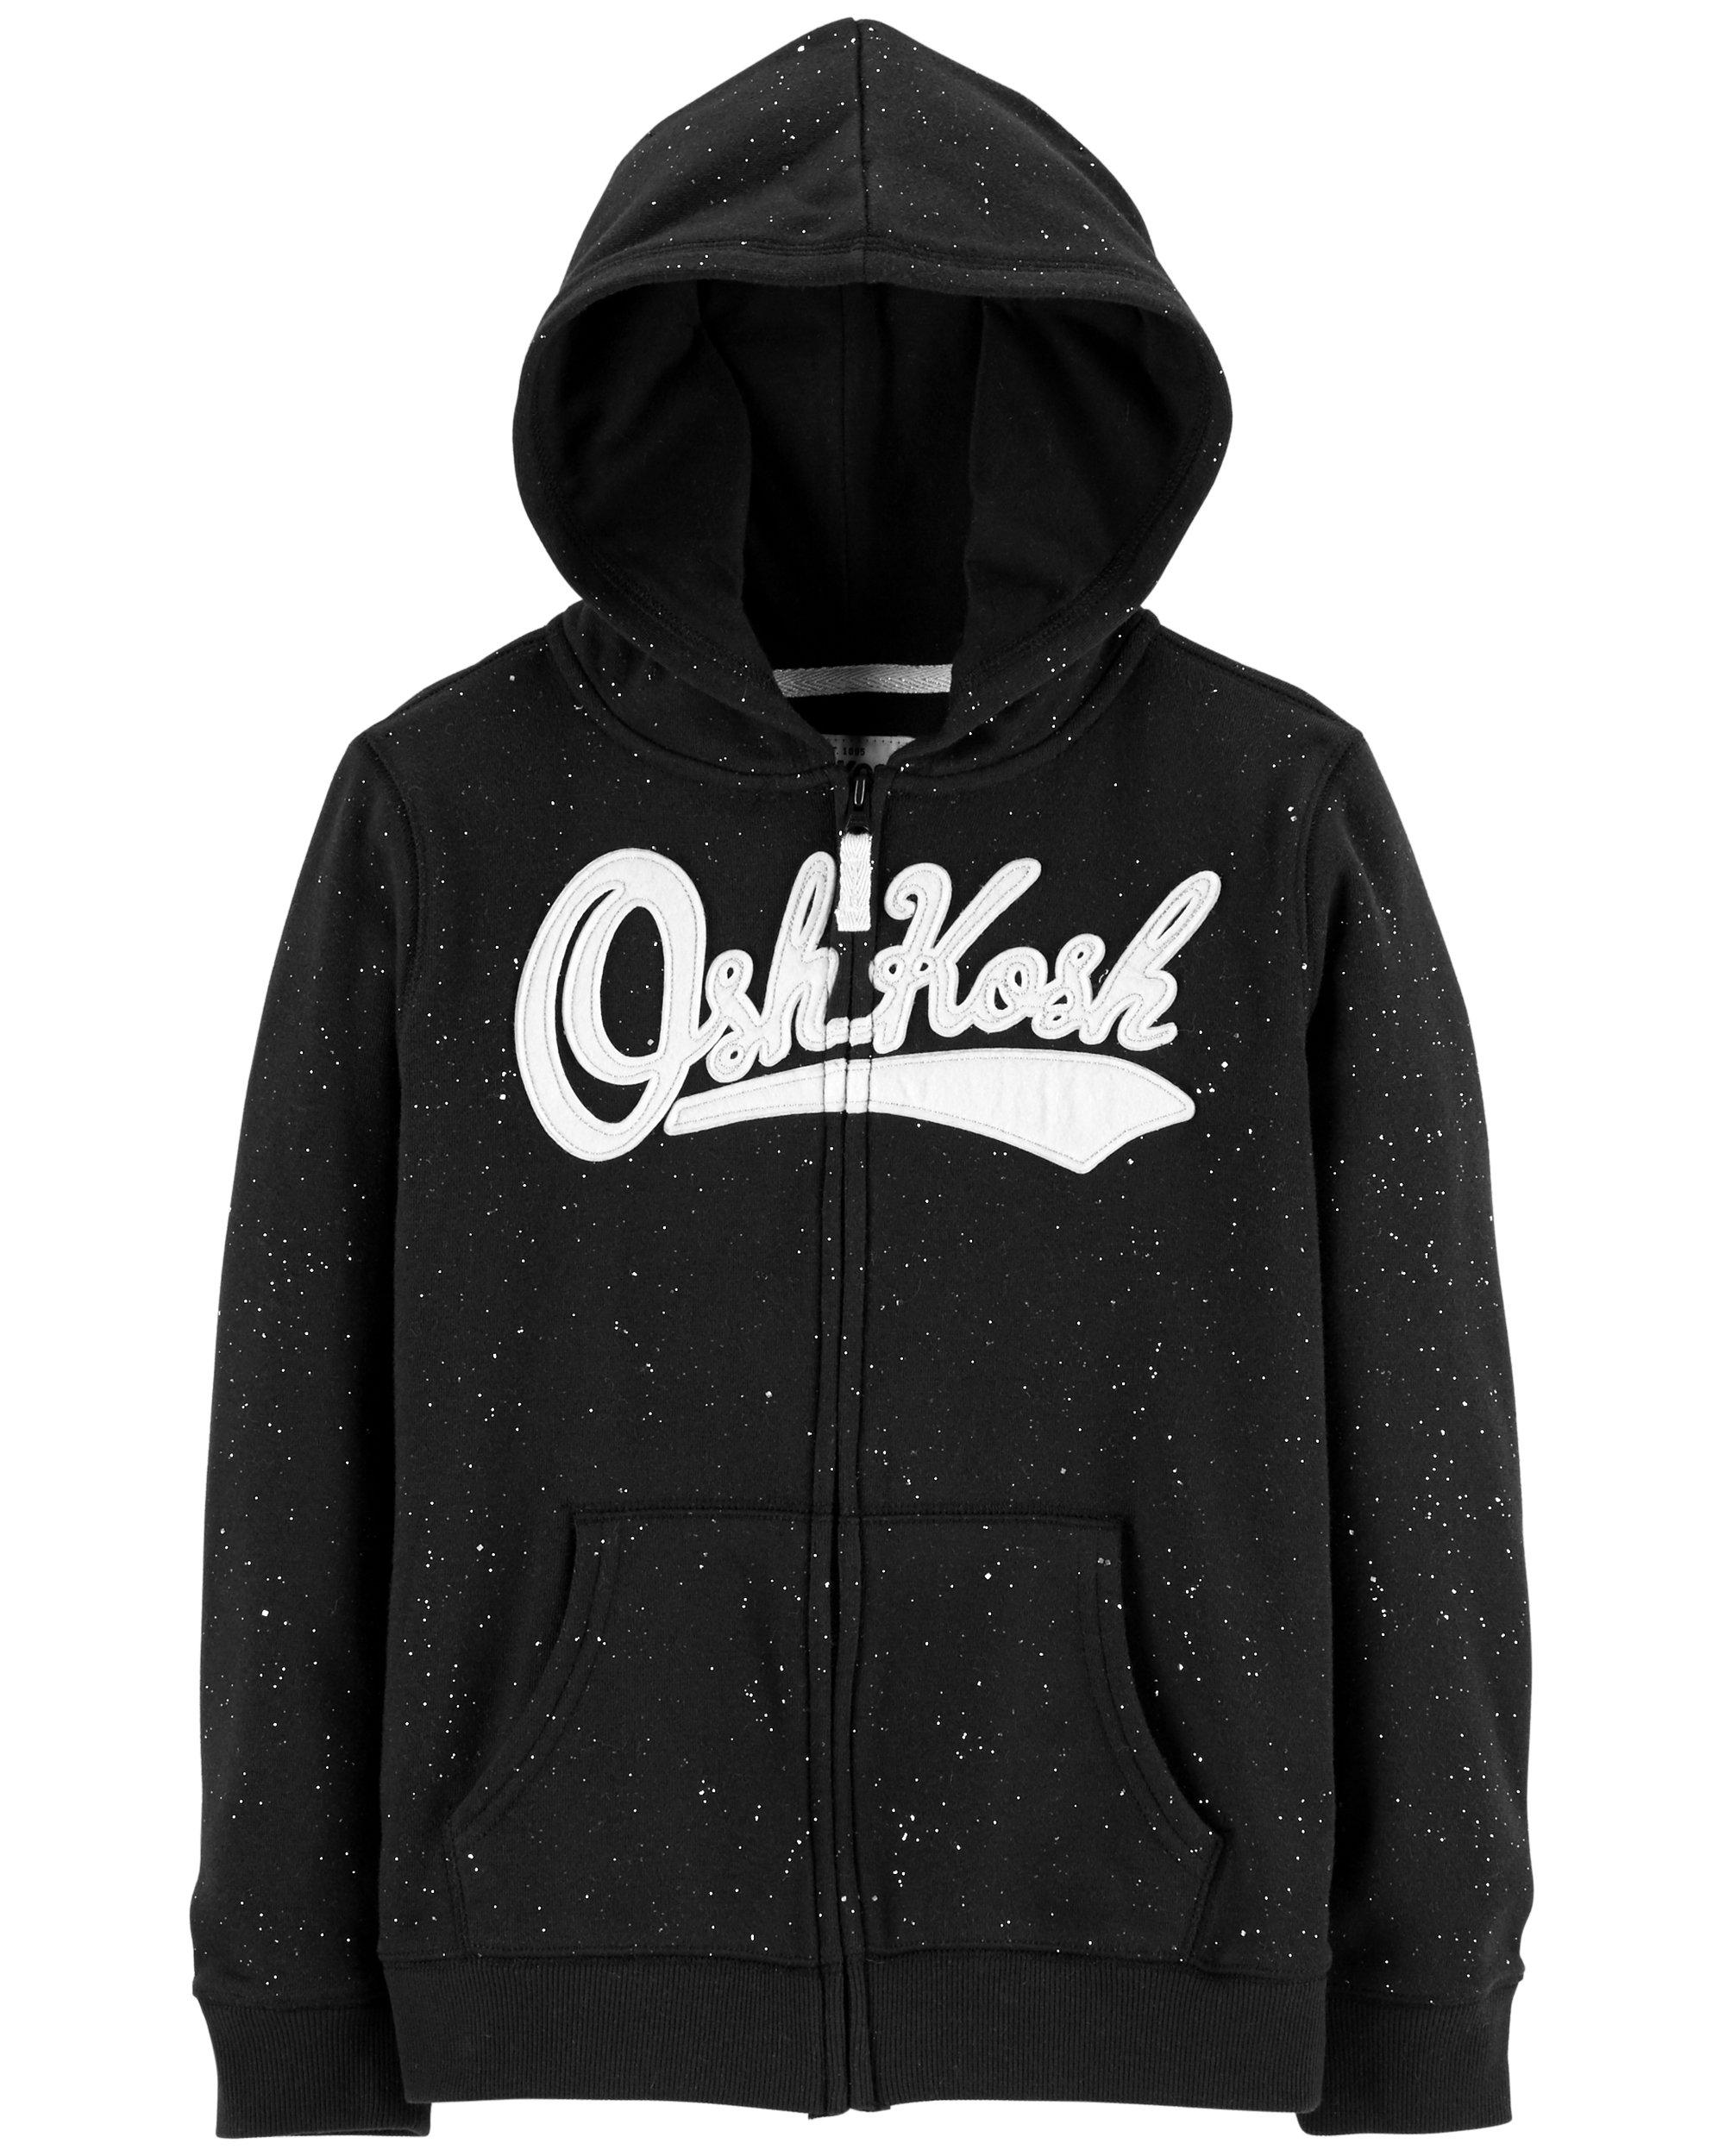 OshKosh B'Gosh Girls' Toddler Full Zip Logo Hoodie, Black Glitter, 4T